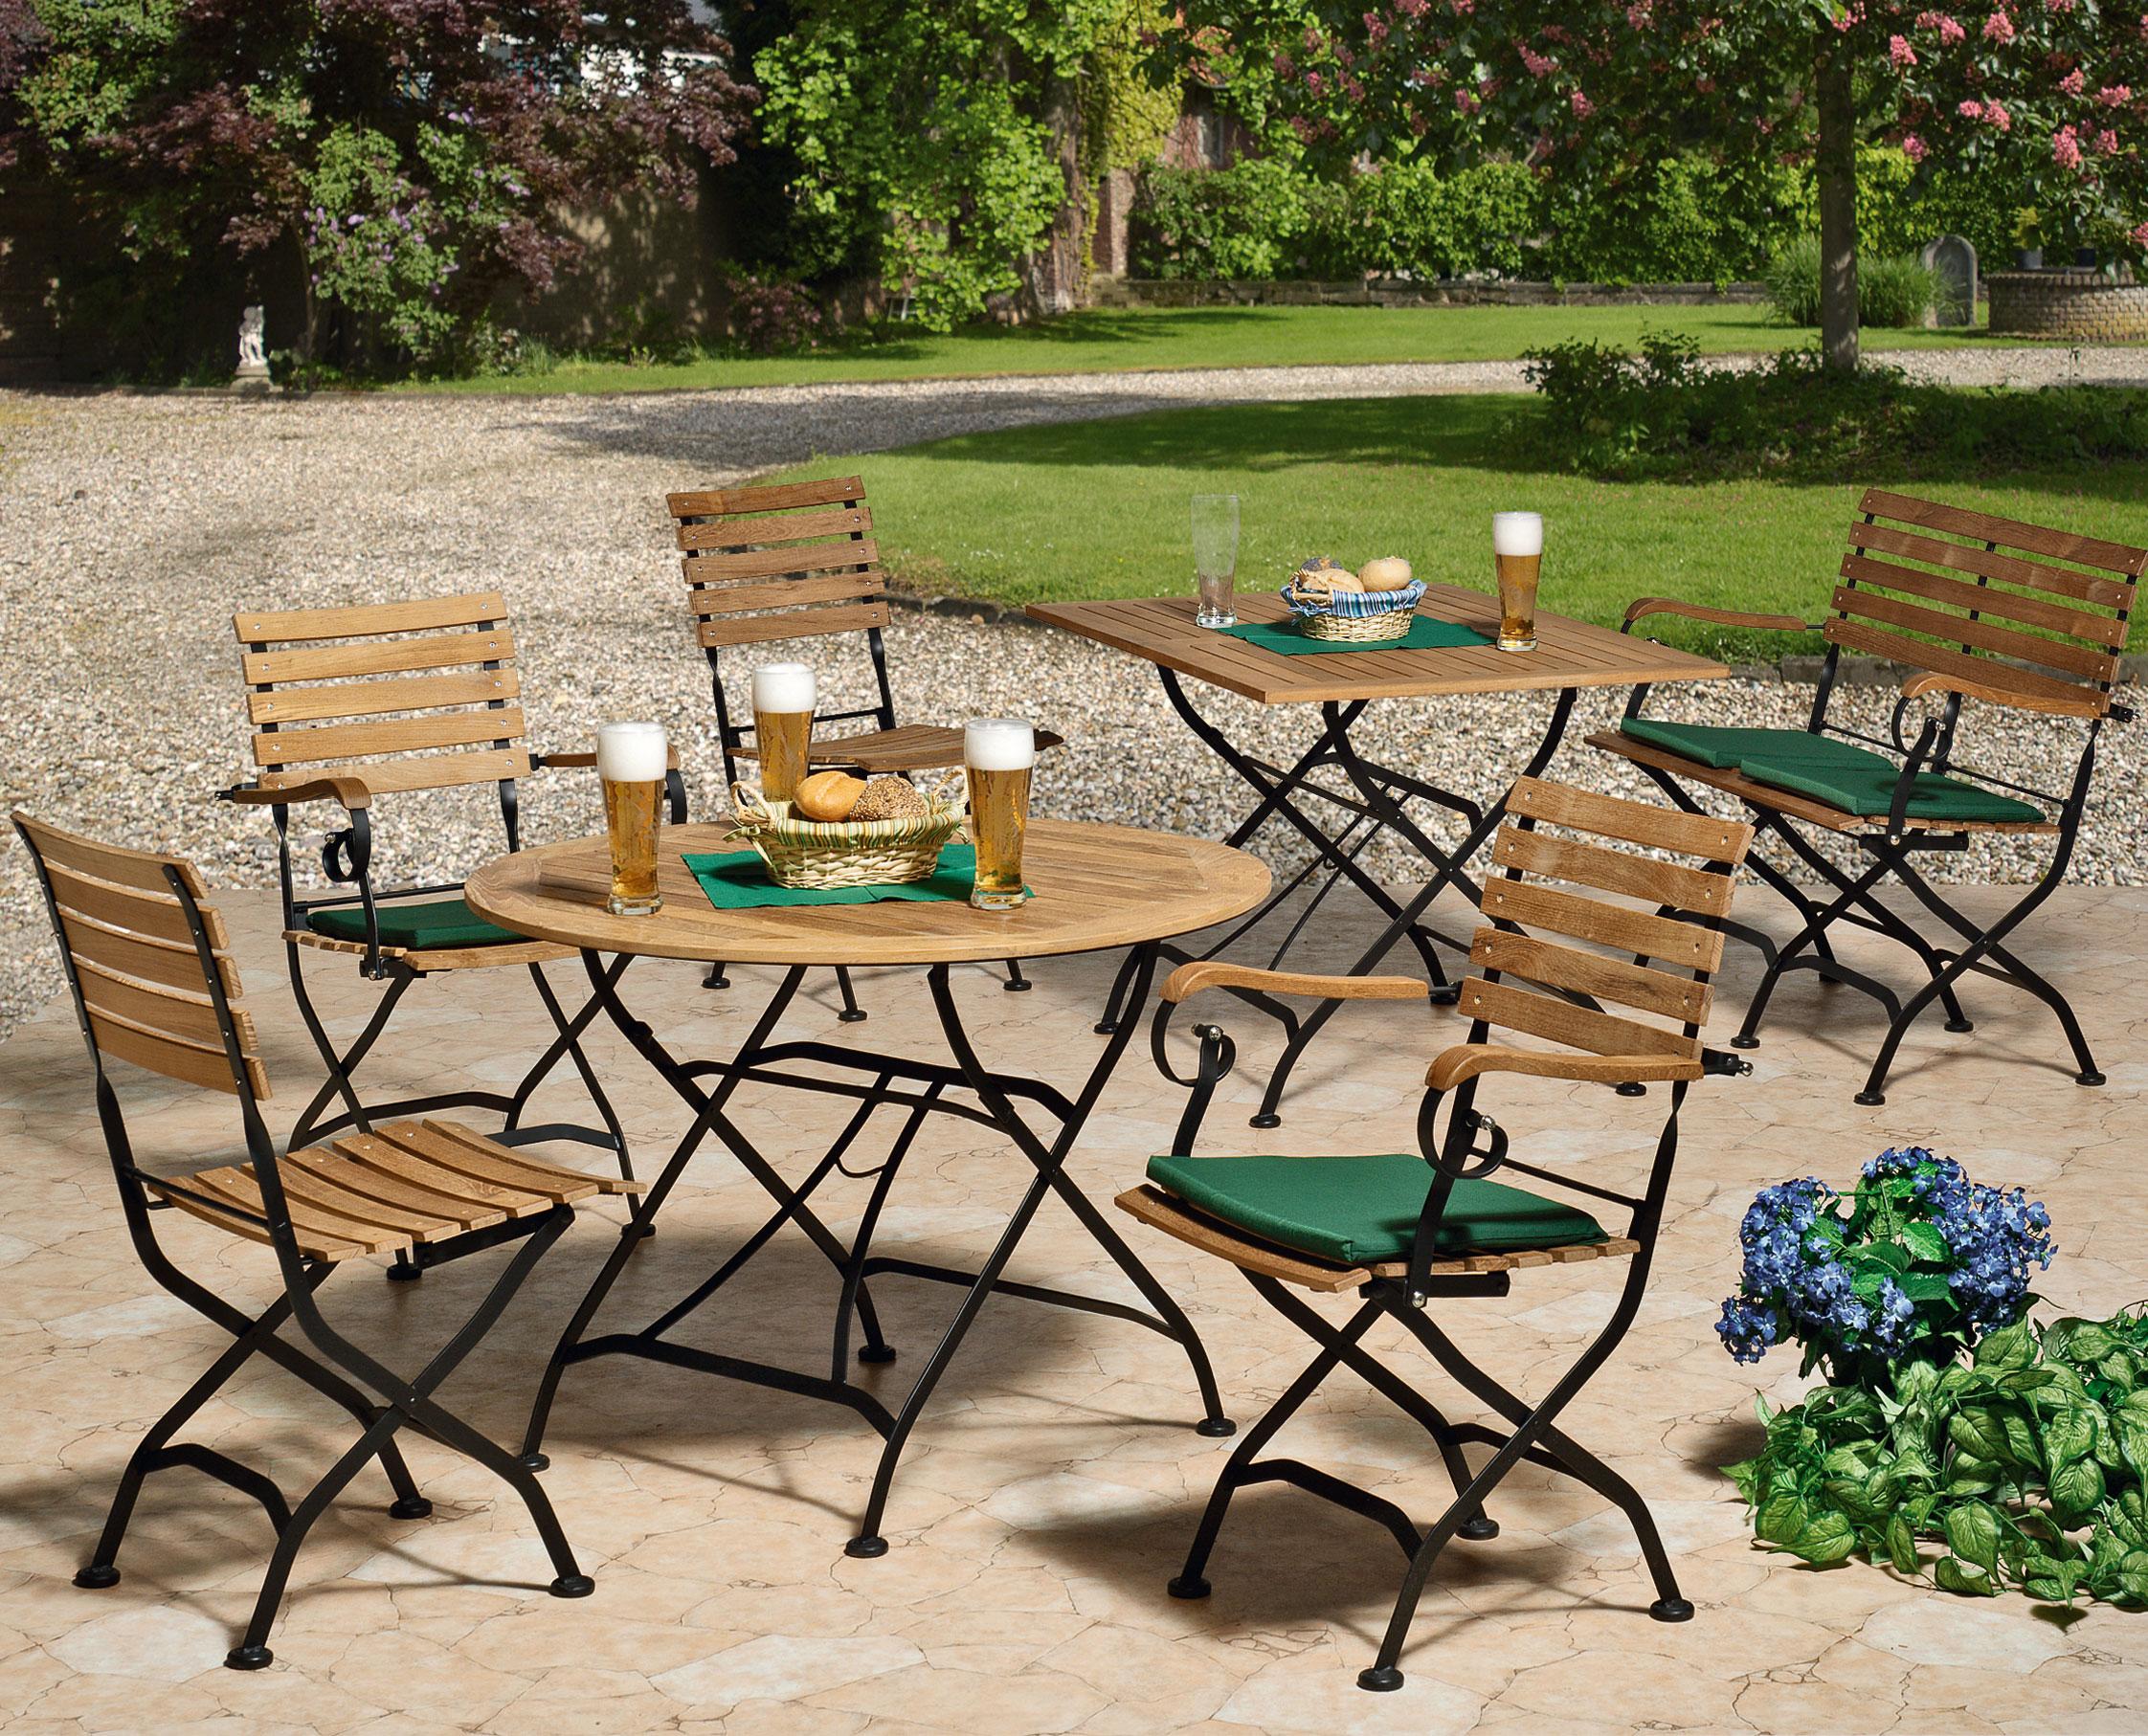 gartenbank biergartenm bel klappbar peru ii 2 sitzer teakholz stahl bei. Black Bedroom Furniture Sets. Home Design Ideas